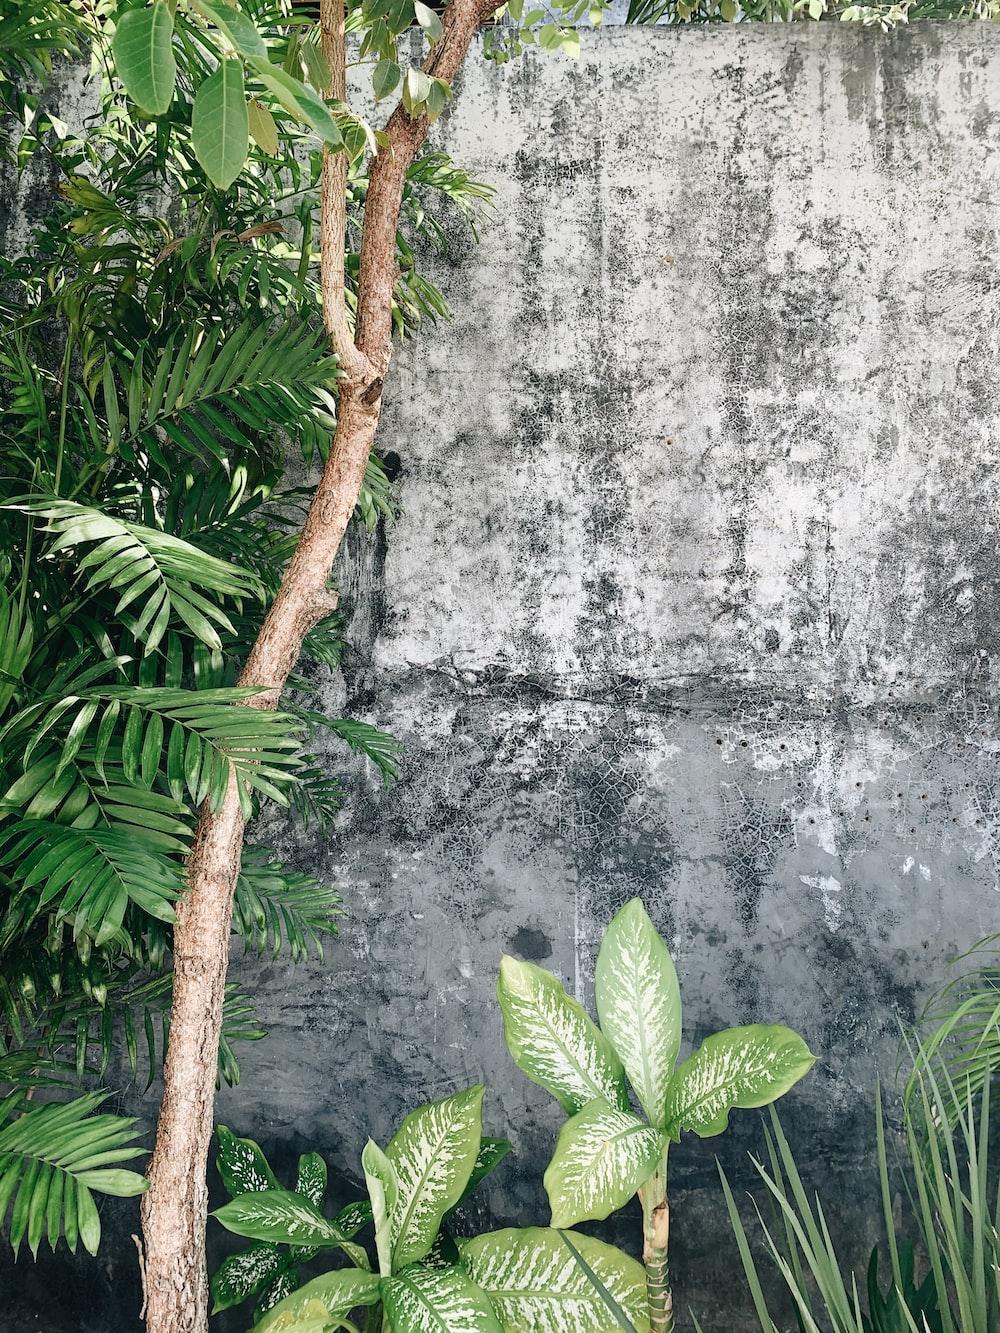 green leaf plant near gray concrete wall